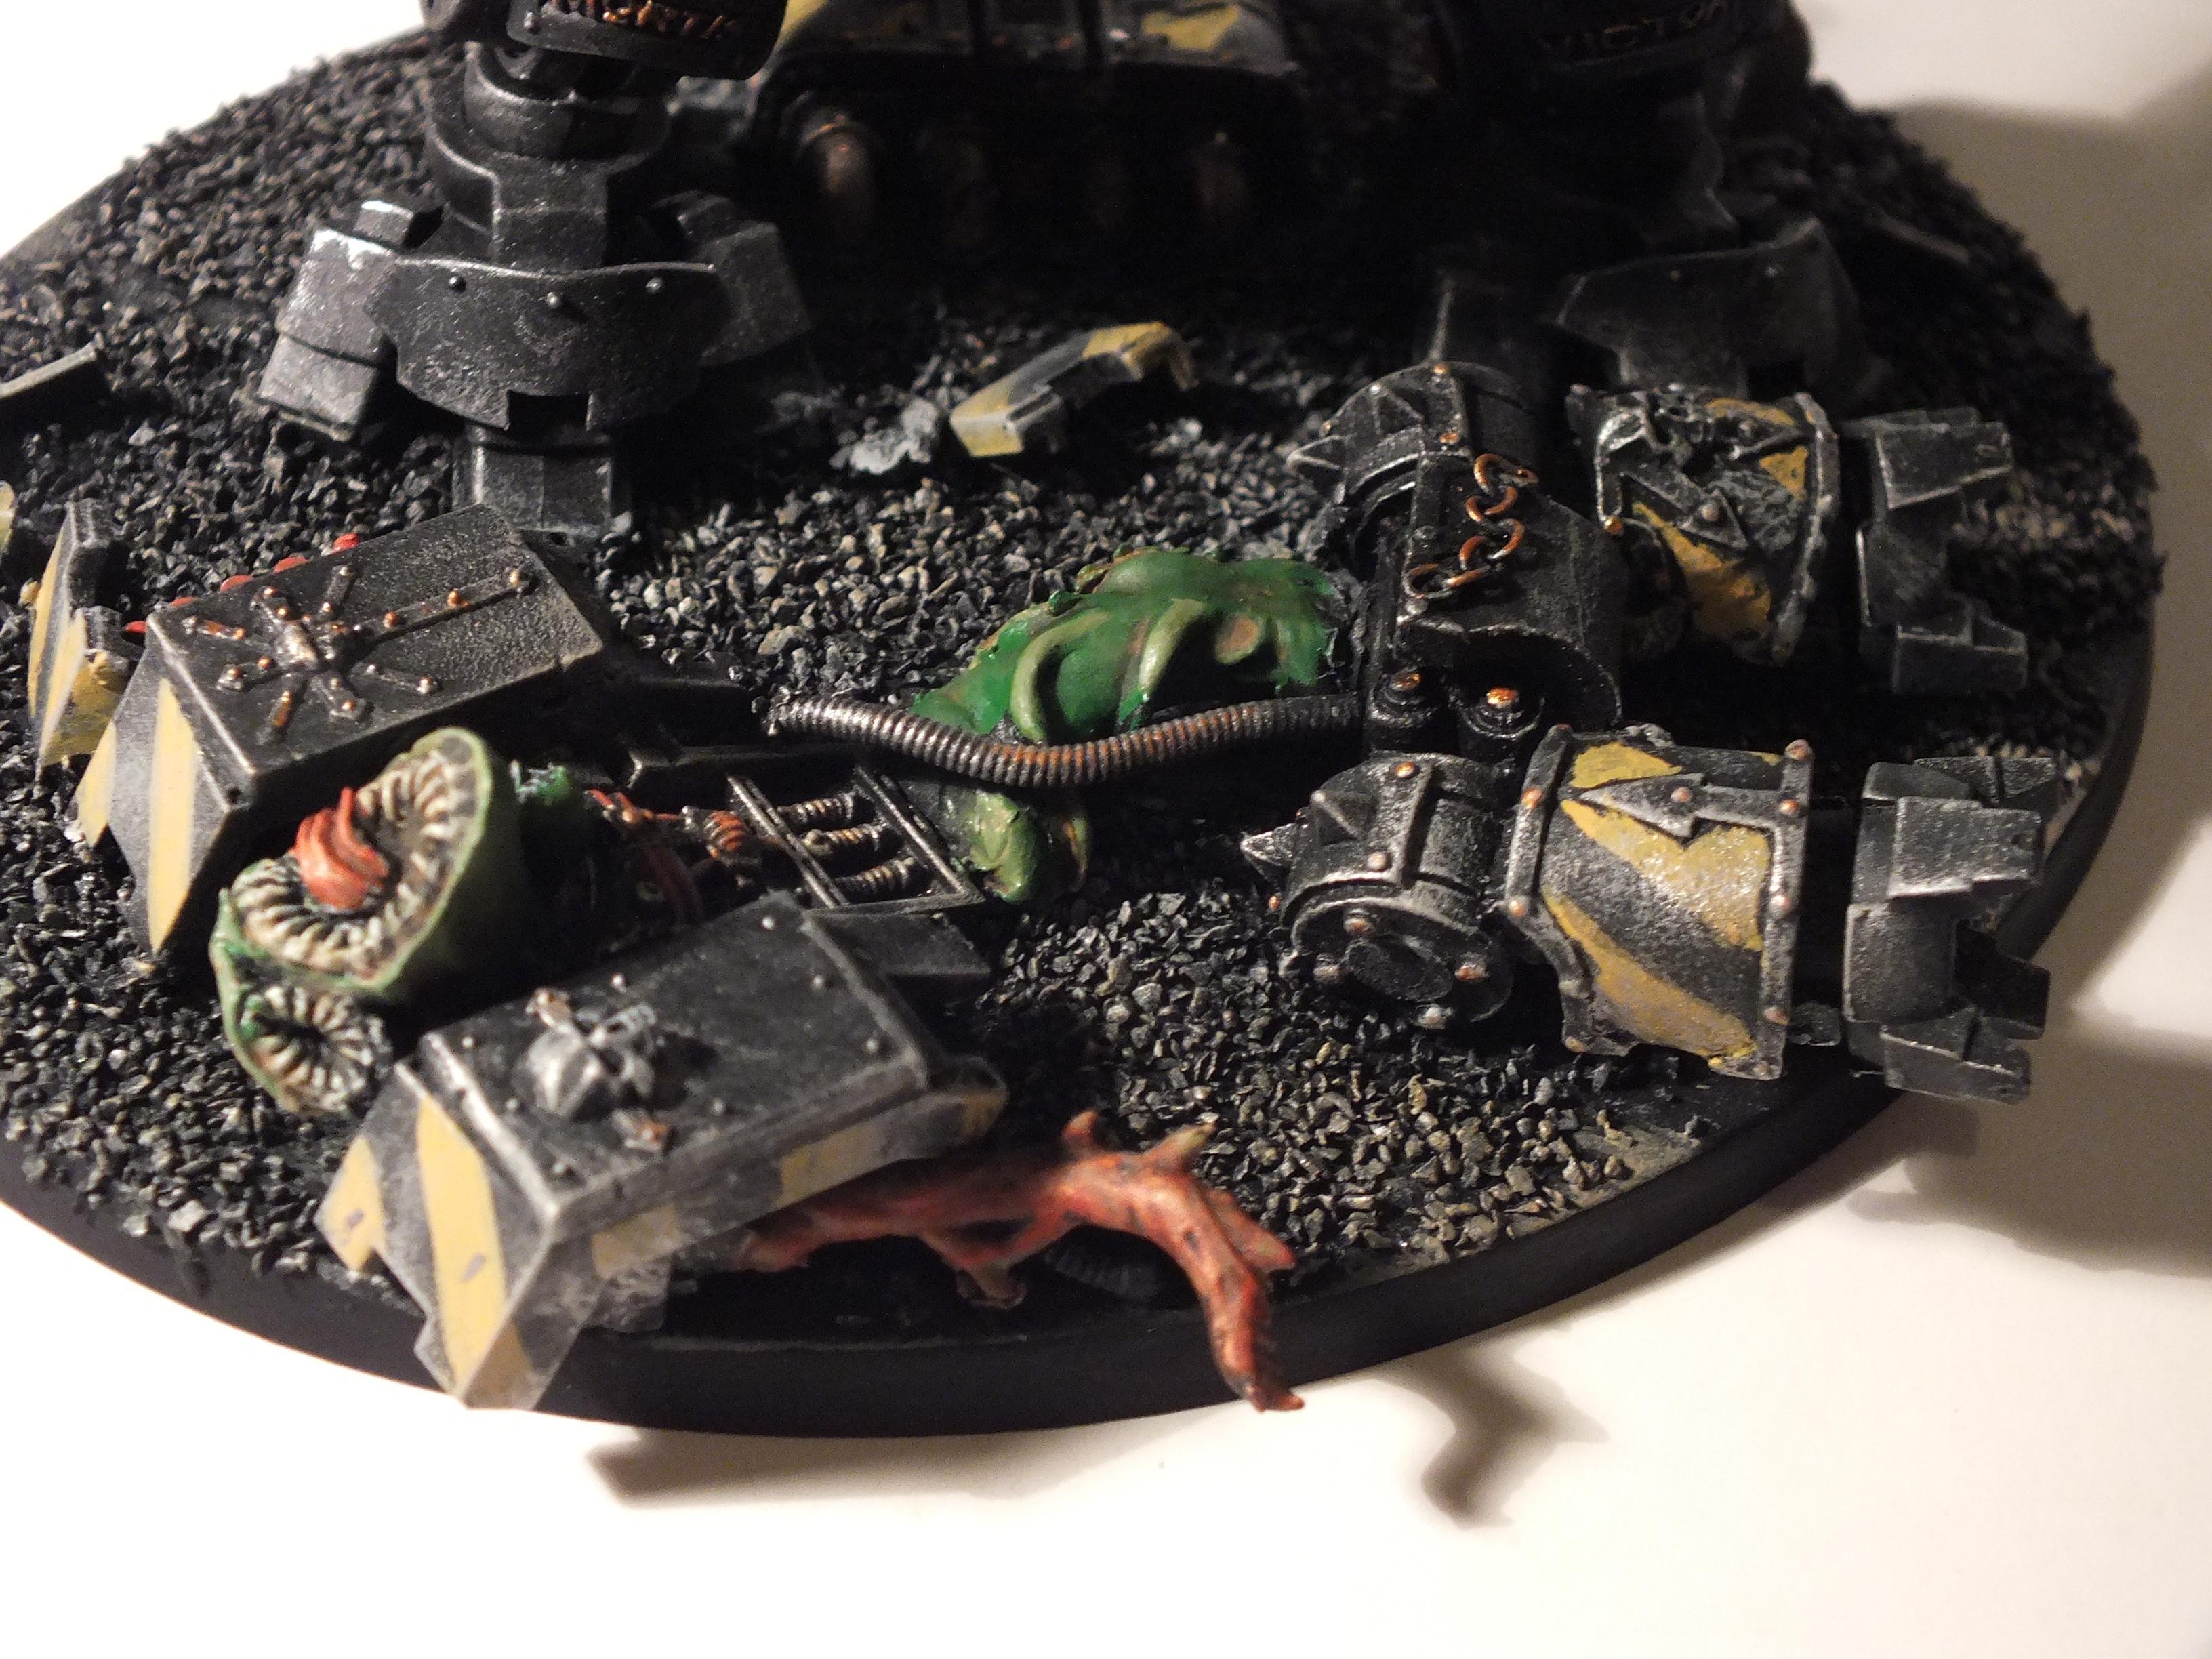 Gk, Grey Knights, NDK base - Iron Warrior d(r)eadnought